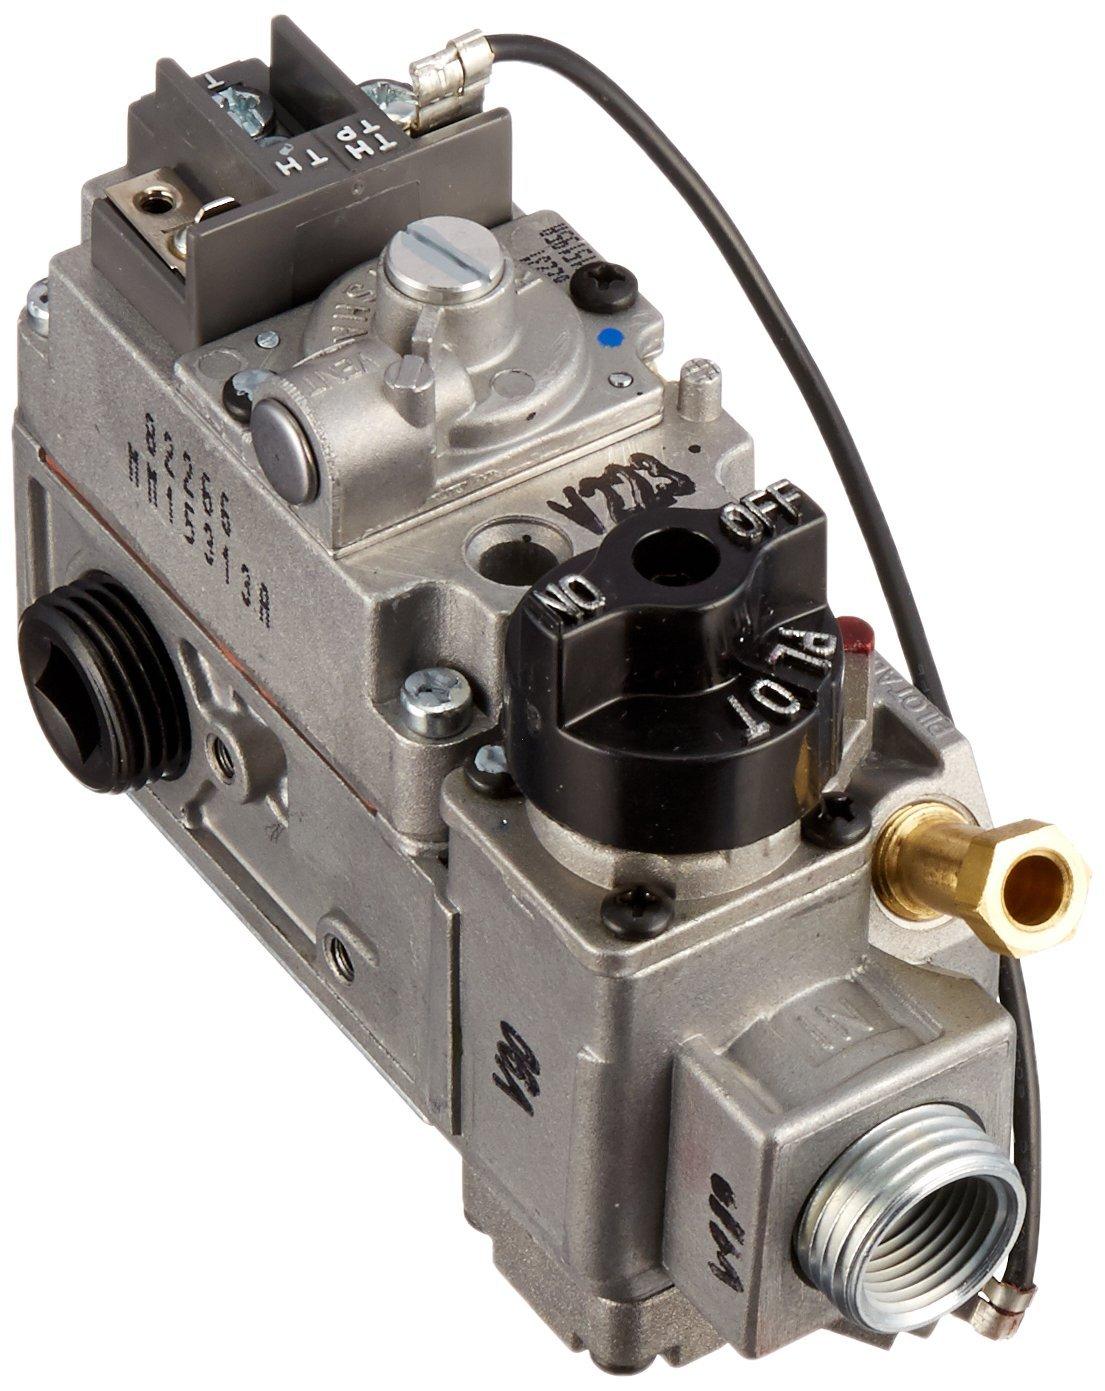 ROBERTSHAW GIDDS-506305 Low-Profile Millivolt Combination Snap Action Gas Valve by Robertshaw